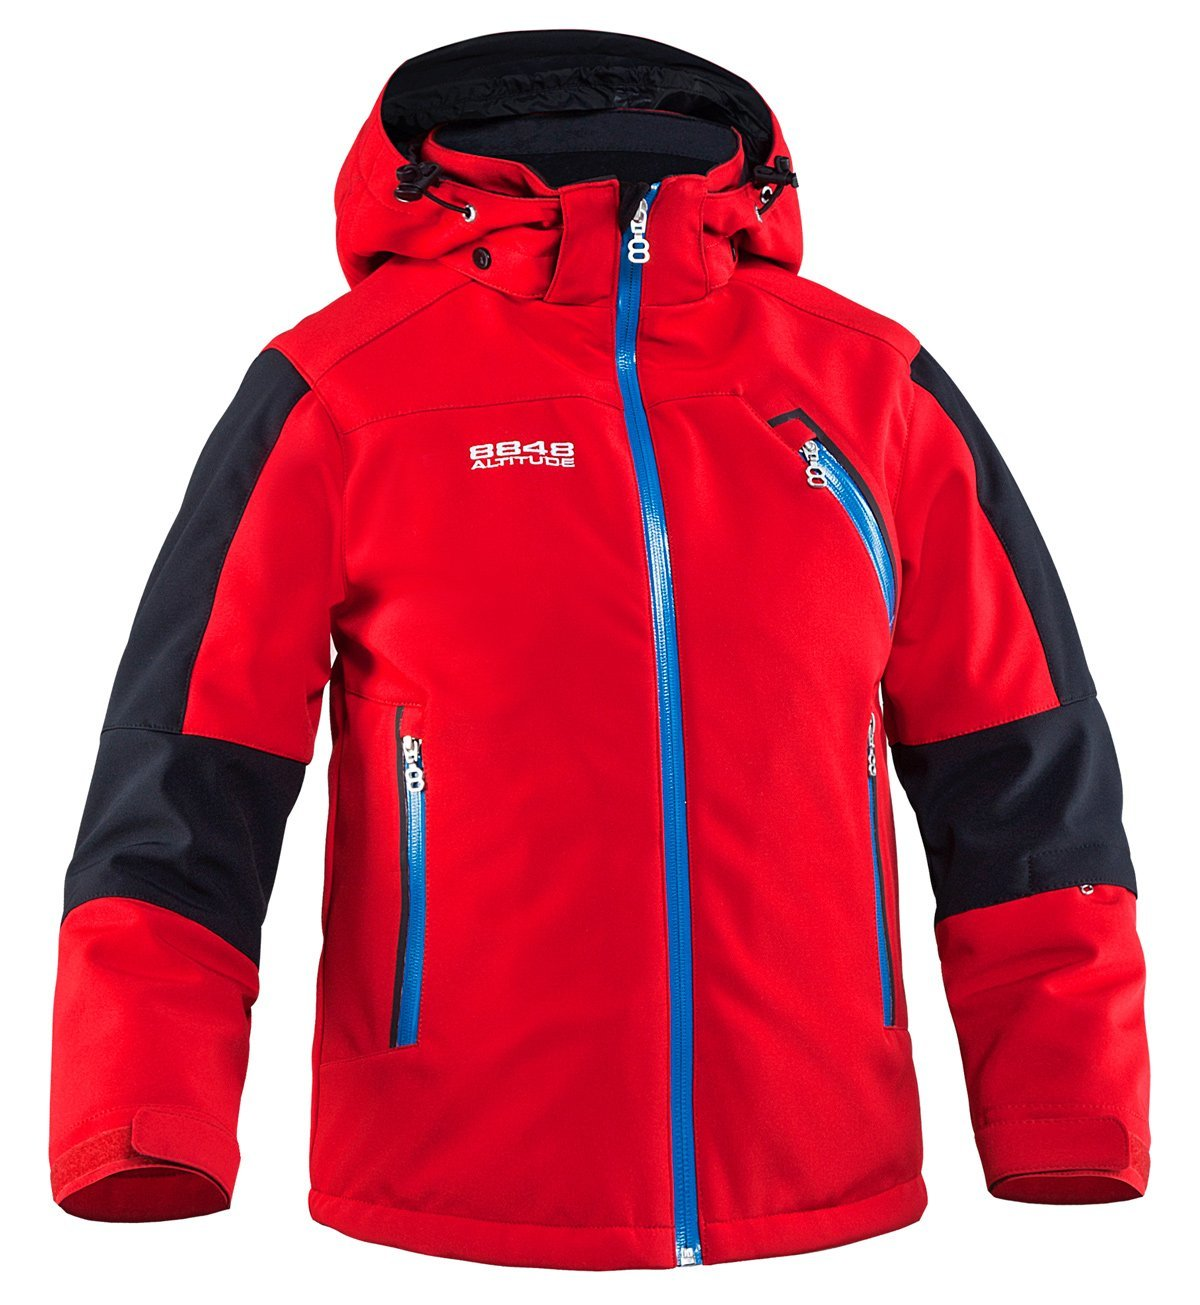 Детская горнолыжная куртка 8848 Altitude Bam (846103) красная